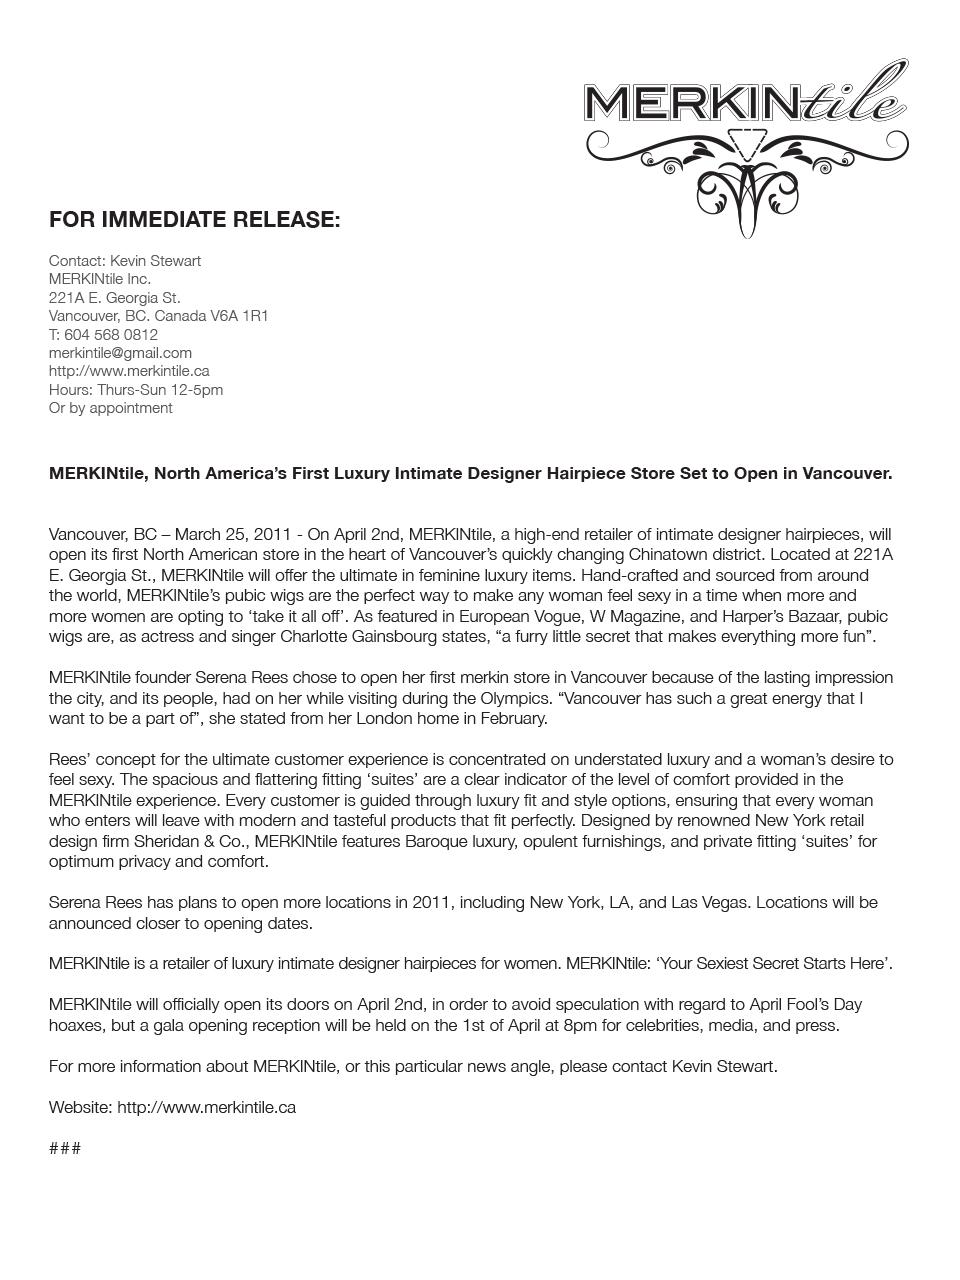 MERKINtile Press Release